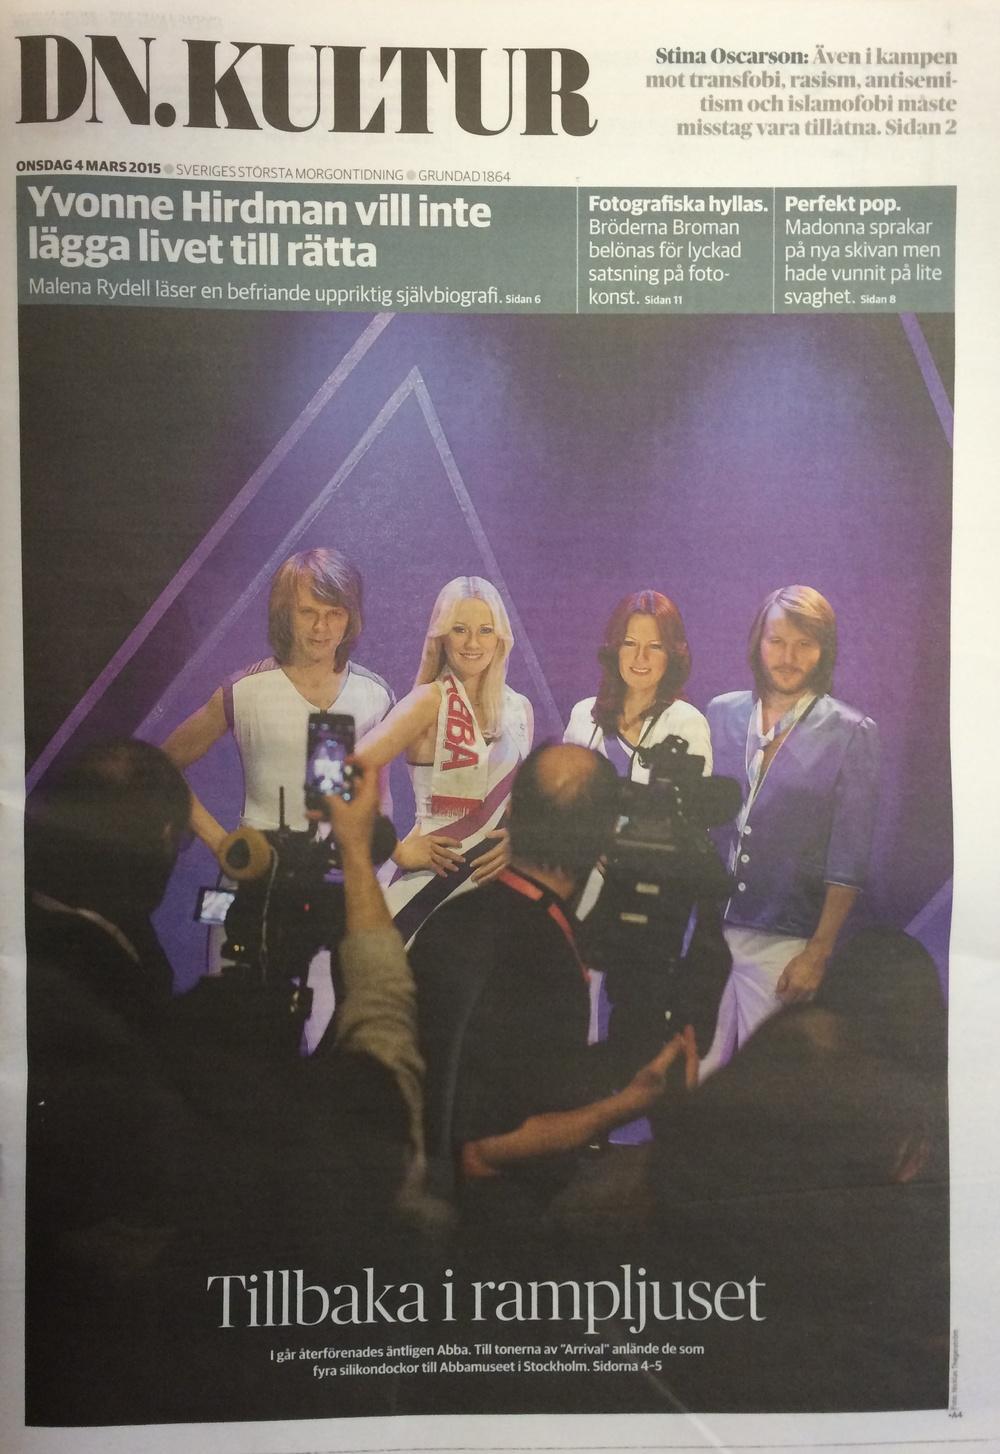 DN Kultur - ABBA The Museums avbilder i silikon.jpg